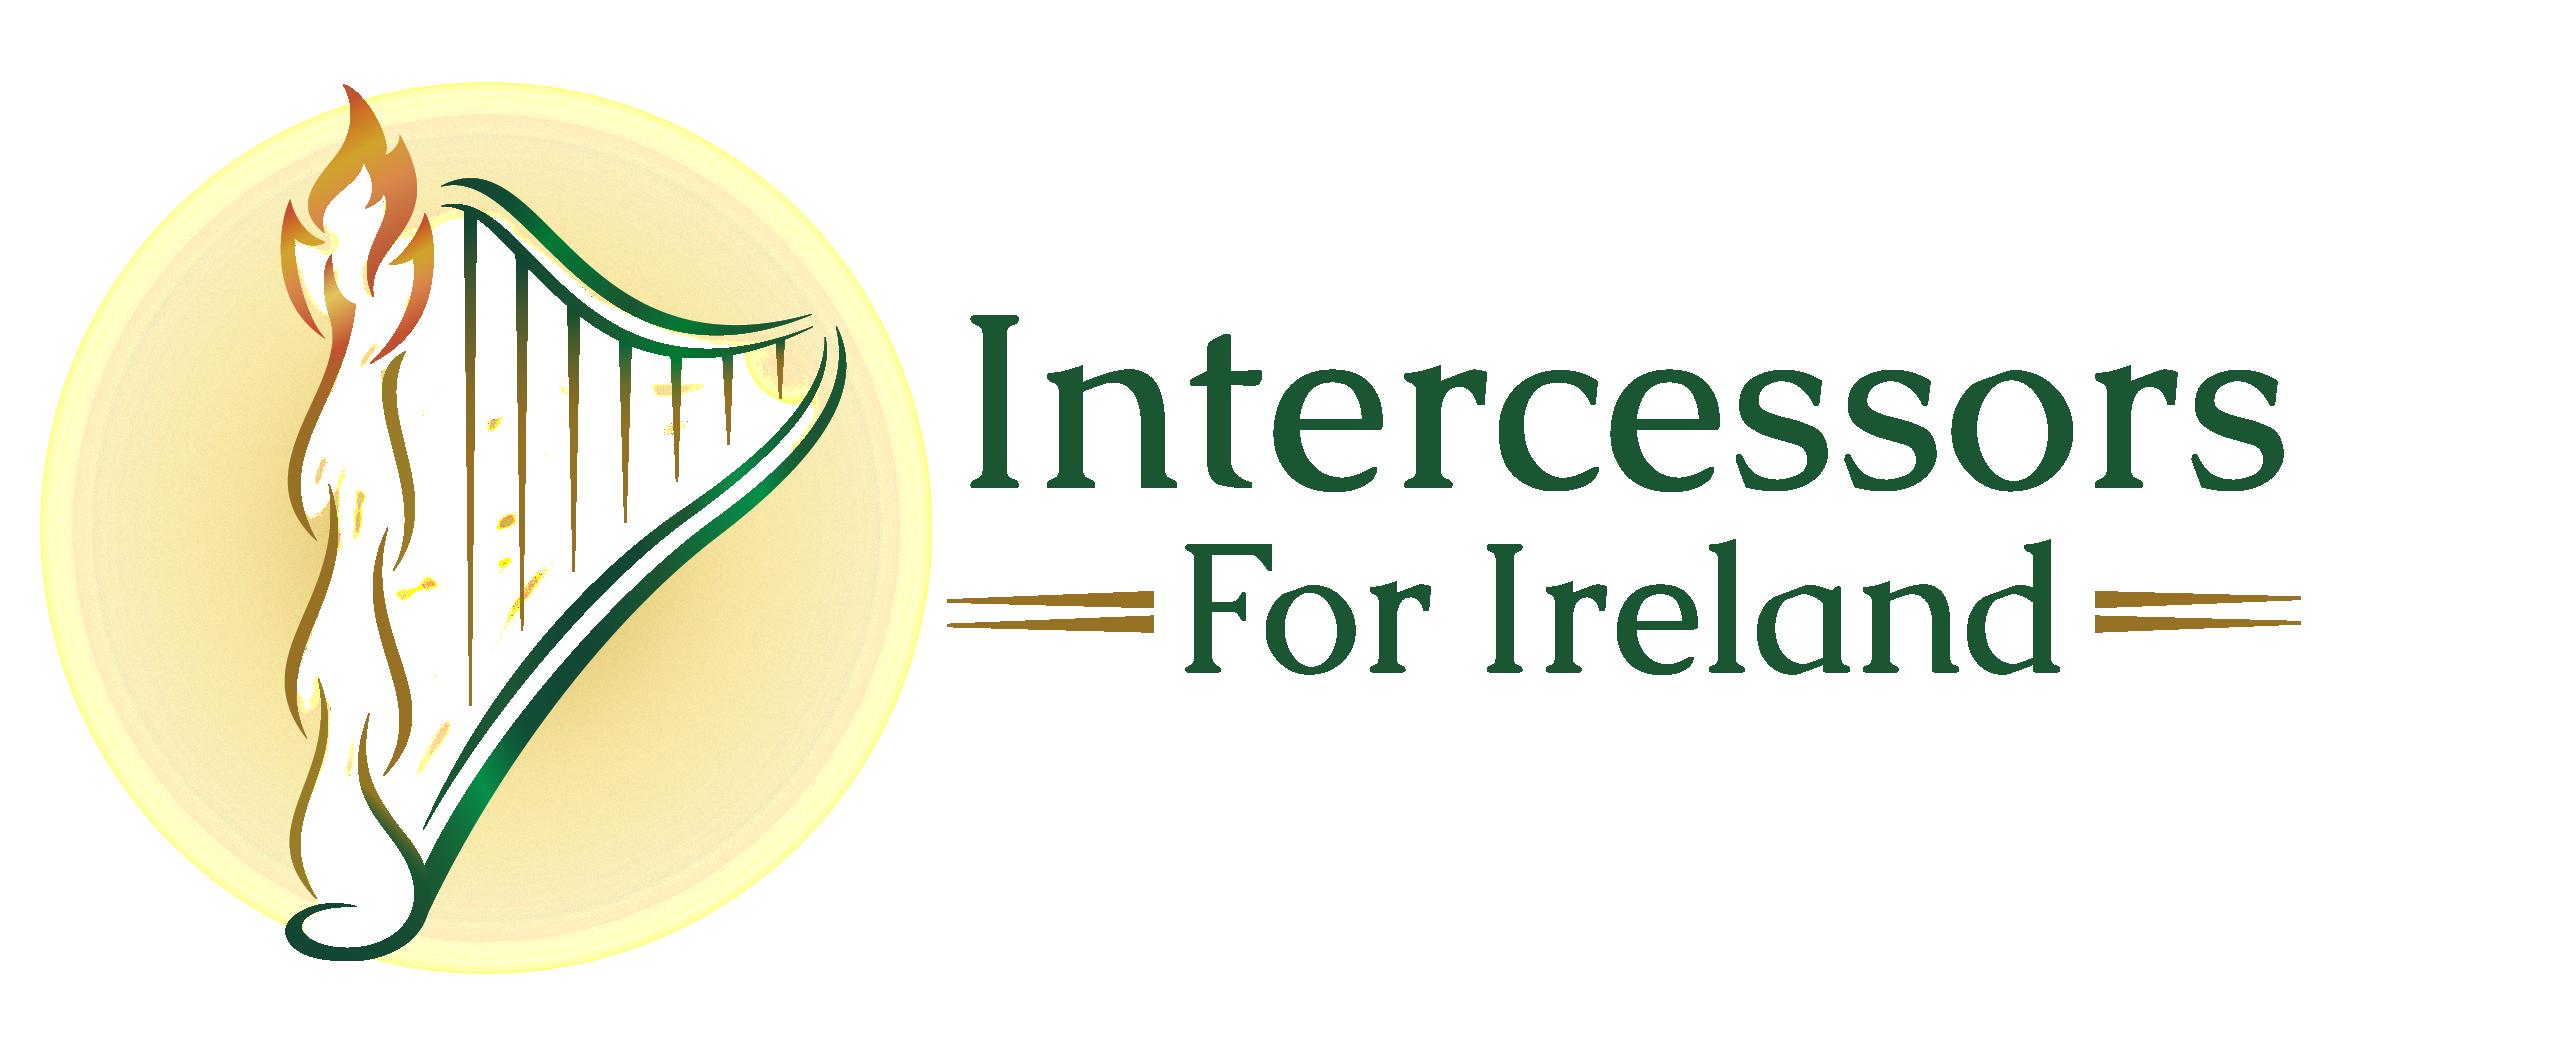 Intercessors for Ireland Logo